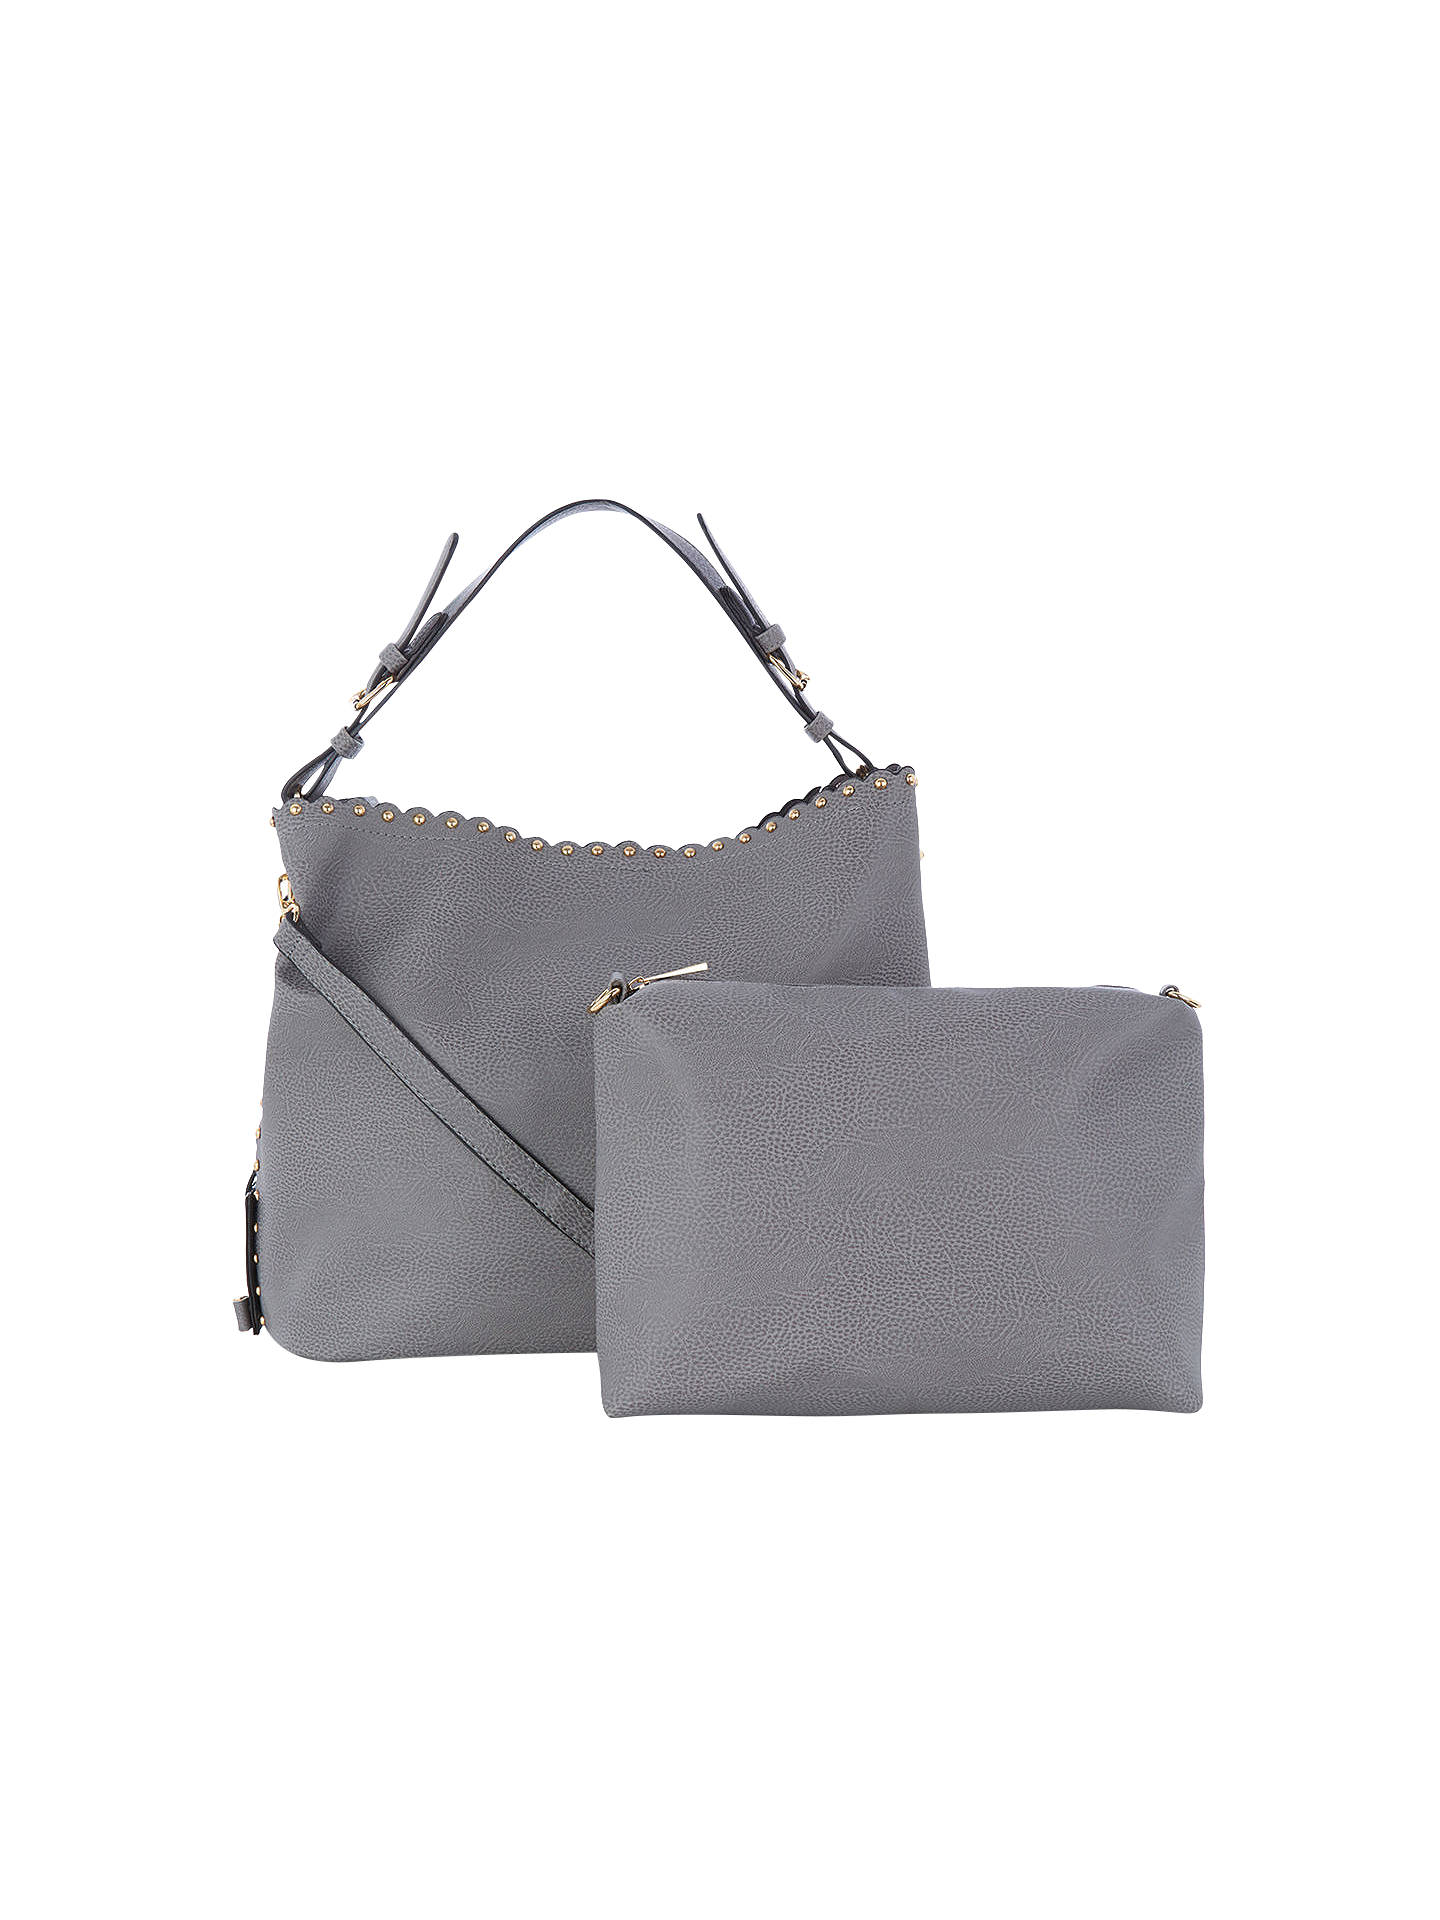 c2aab754b1cb ... Buy Oasis Skylar Scalloped Hobo Bag, Mid Grey Online at johnlewis.com  ...